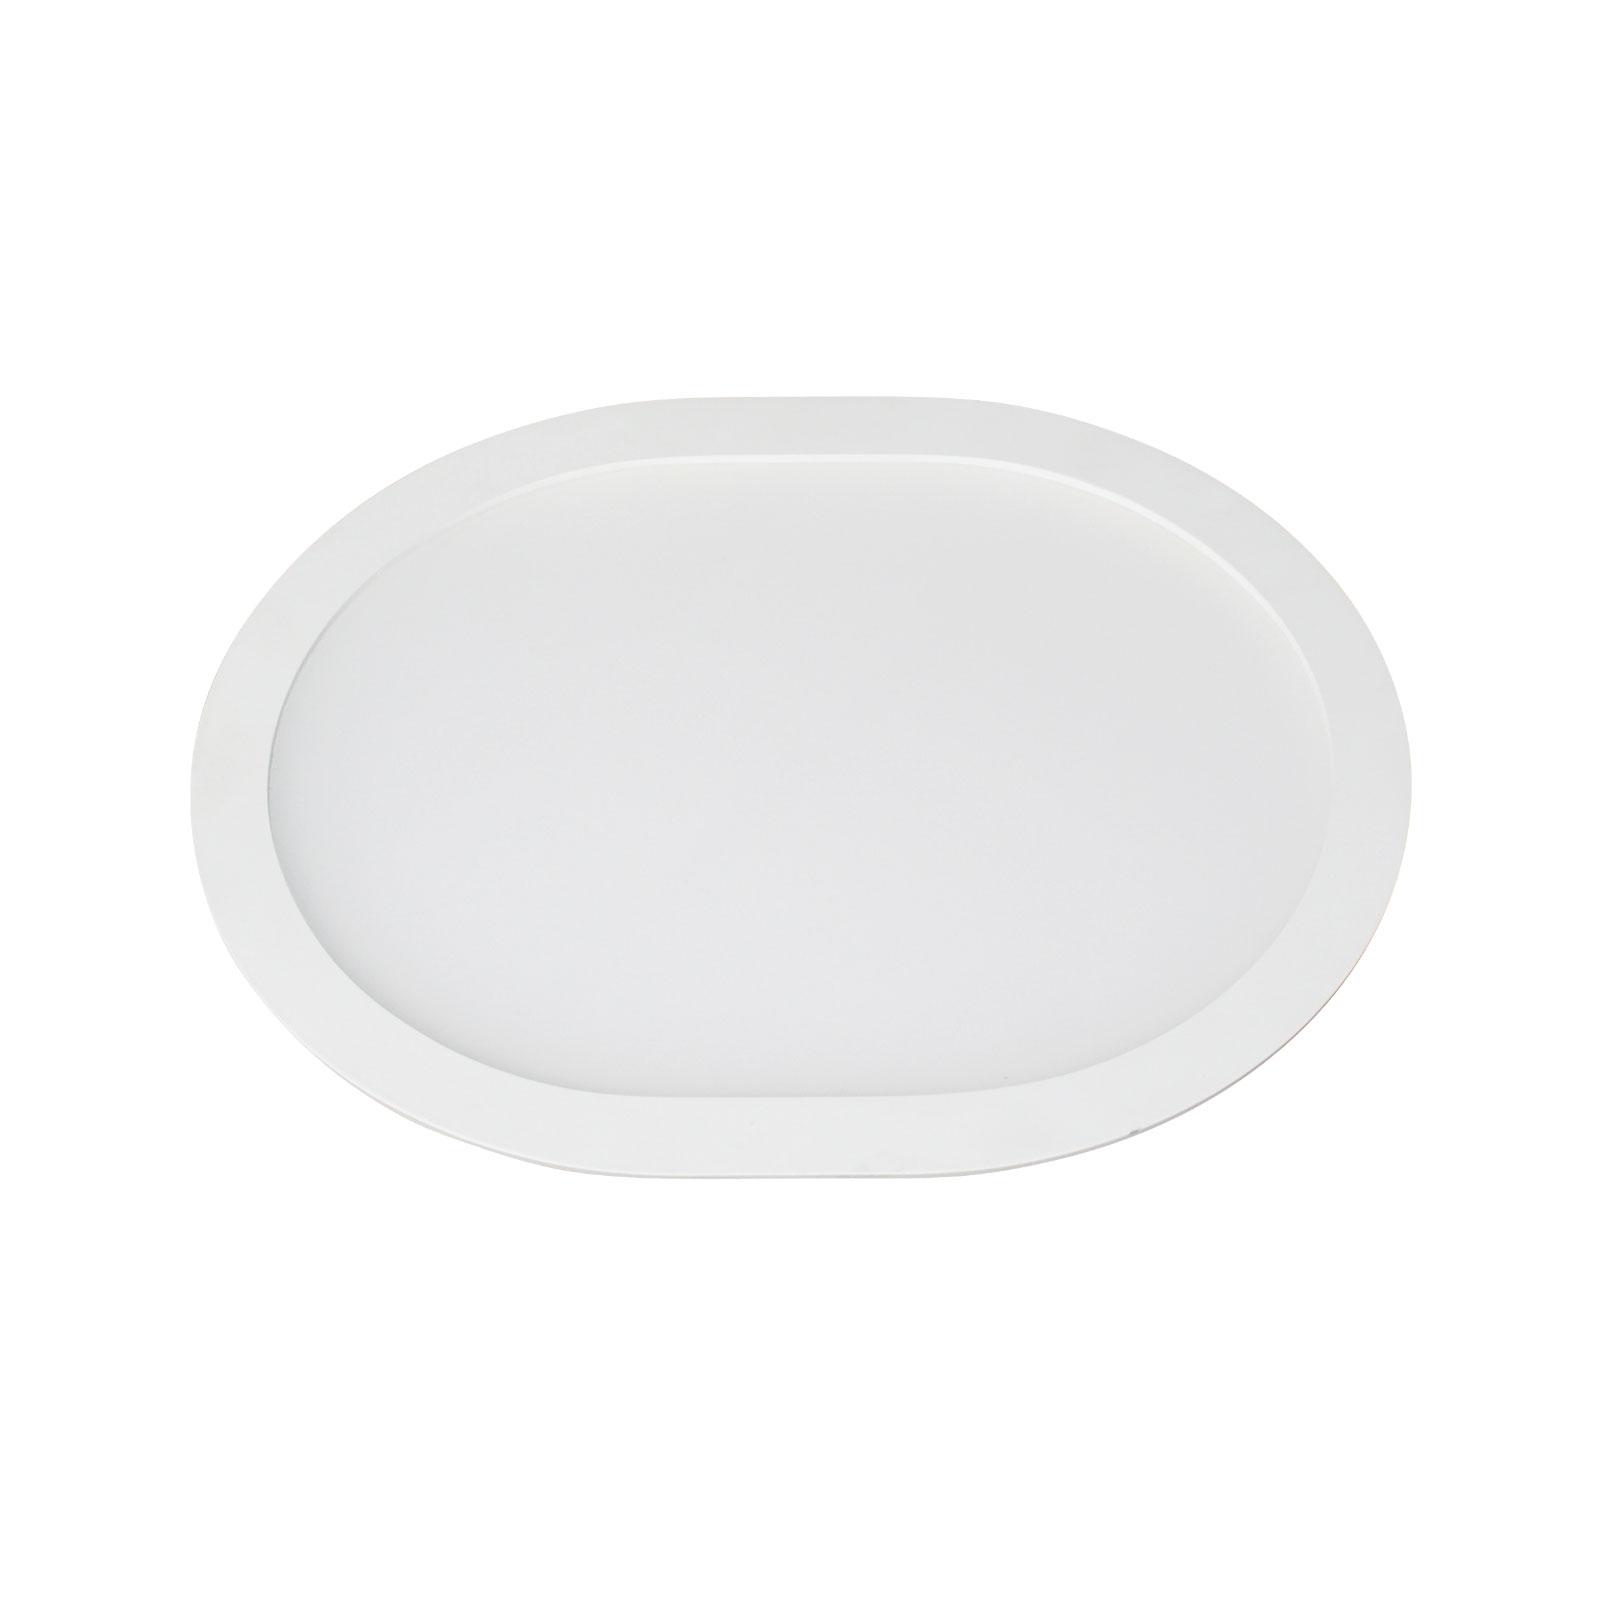 LED-Einbaupanel Ovale 3.000 K, 18 cm x 15 cm